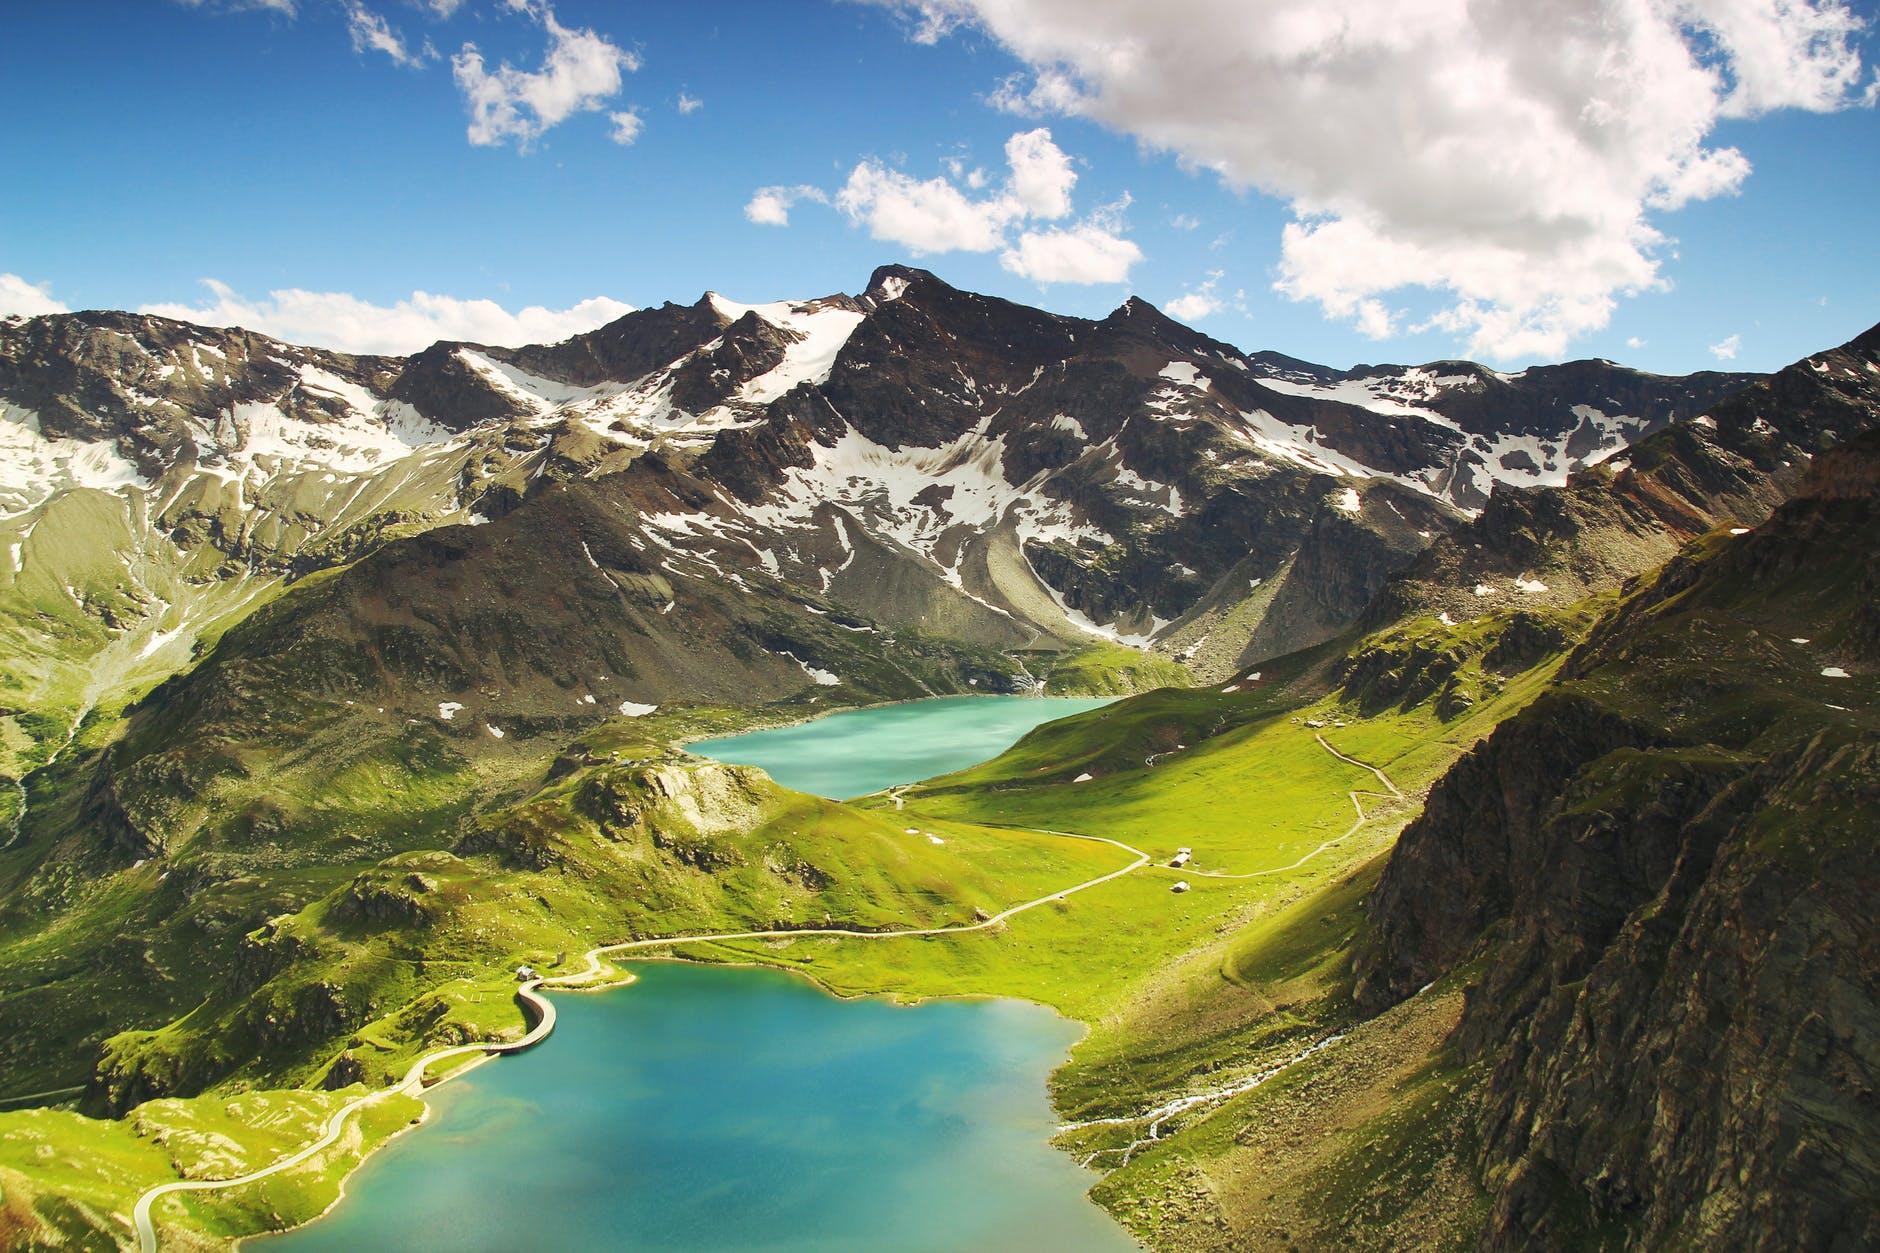 aerial alpine ceresole reale desktop backgrounds